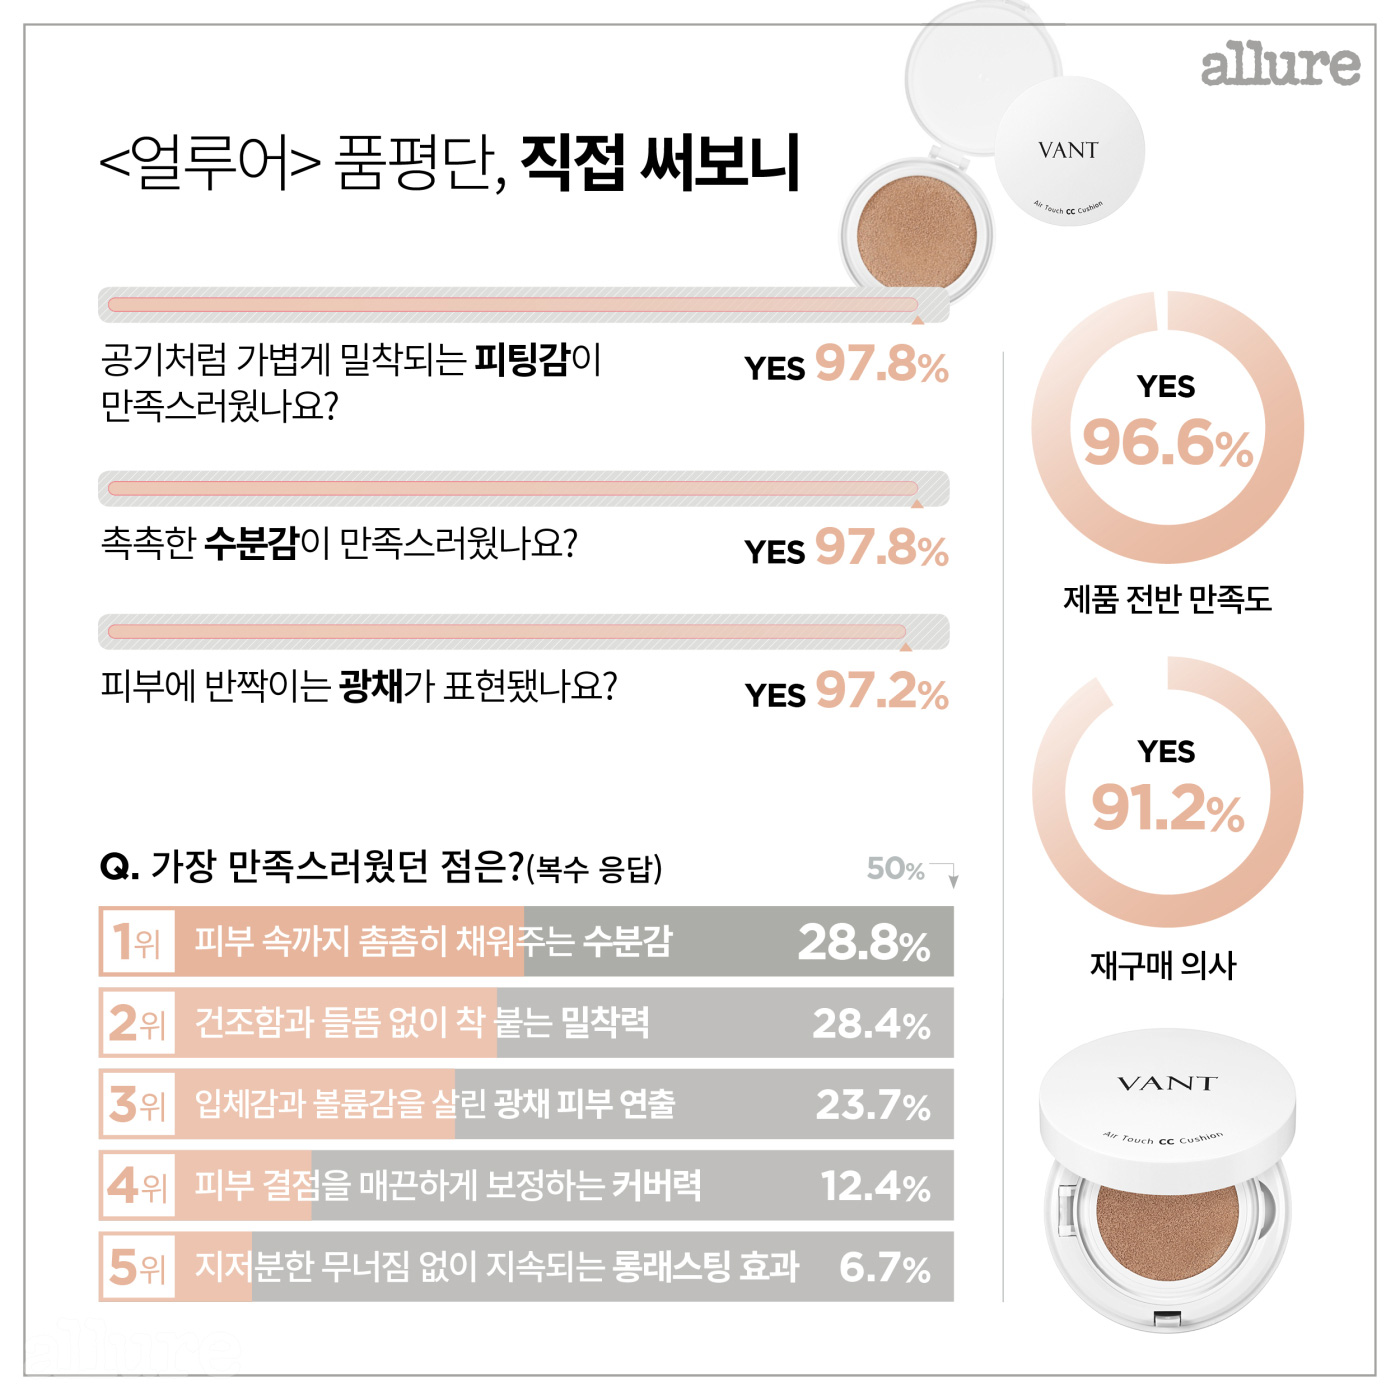 CARD 품평단 반트 최종4